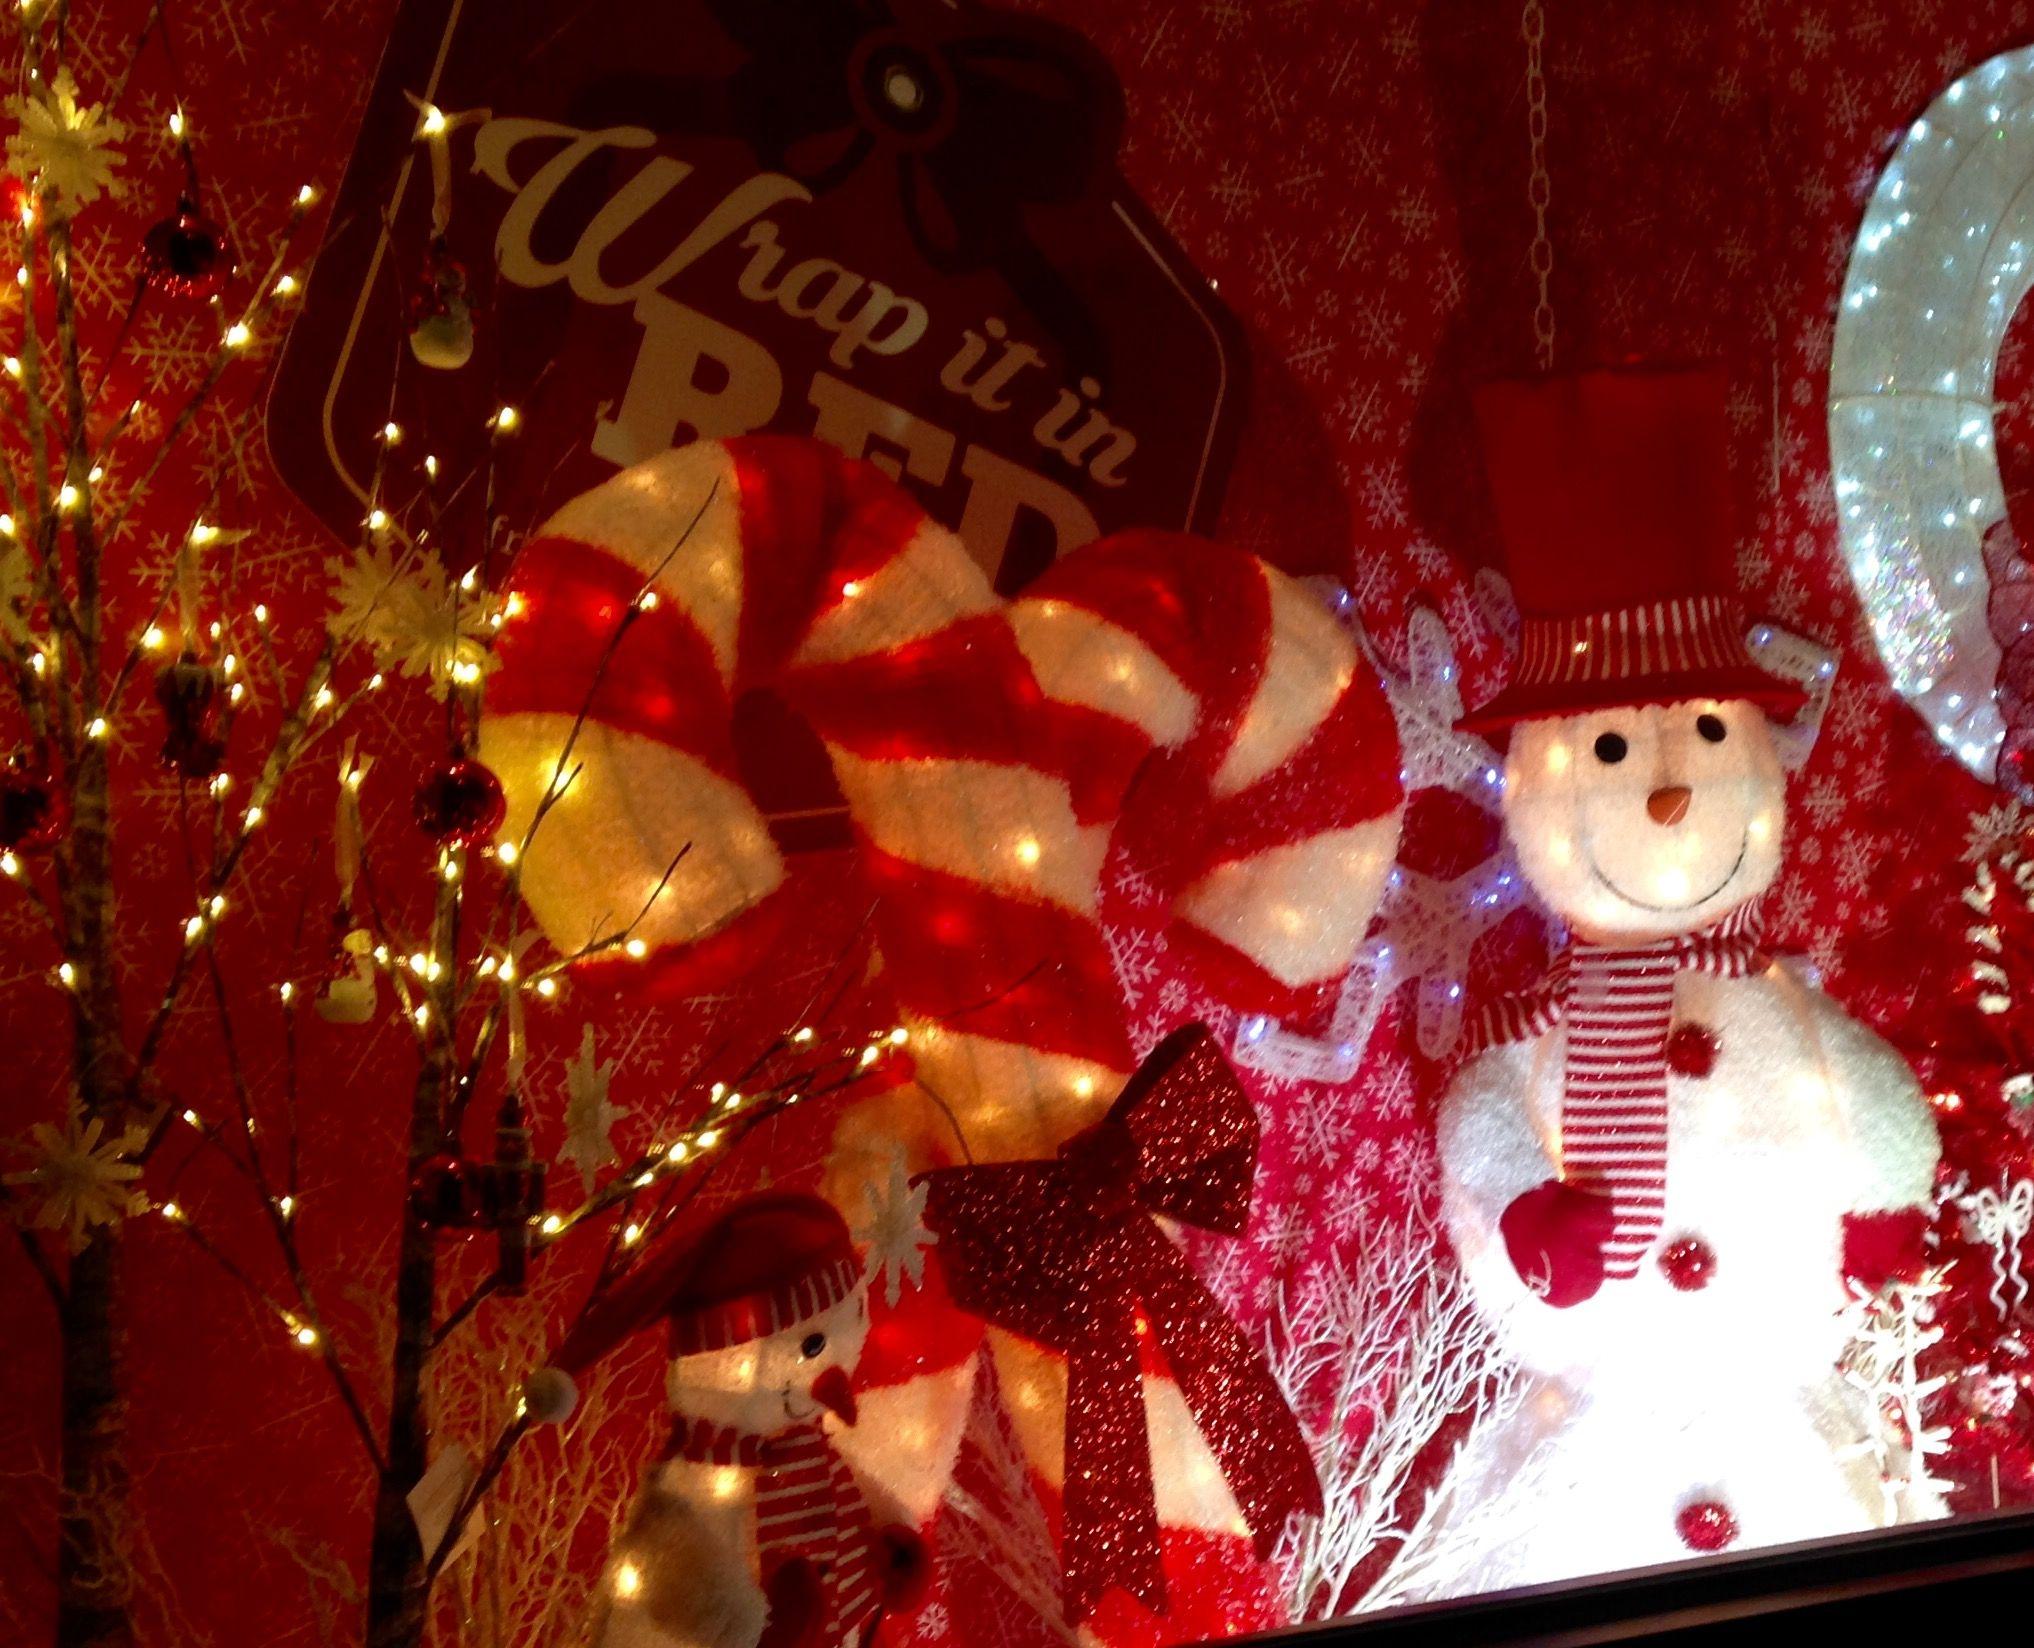 Ace Hardware Window Outdoor Christmas Decorations Christmas Decorations Outdoor Christmas